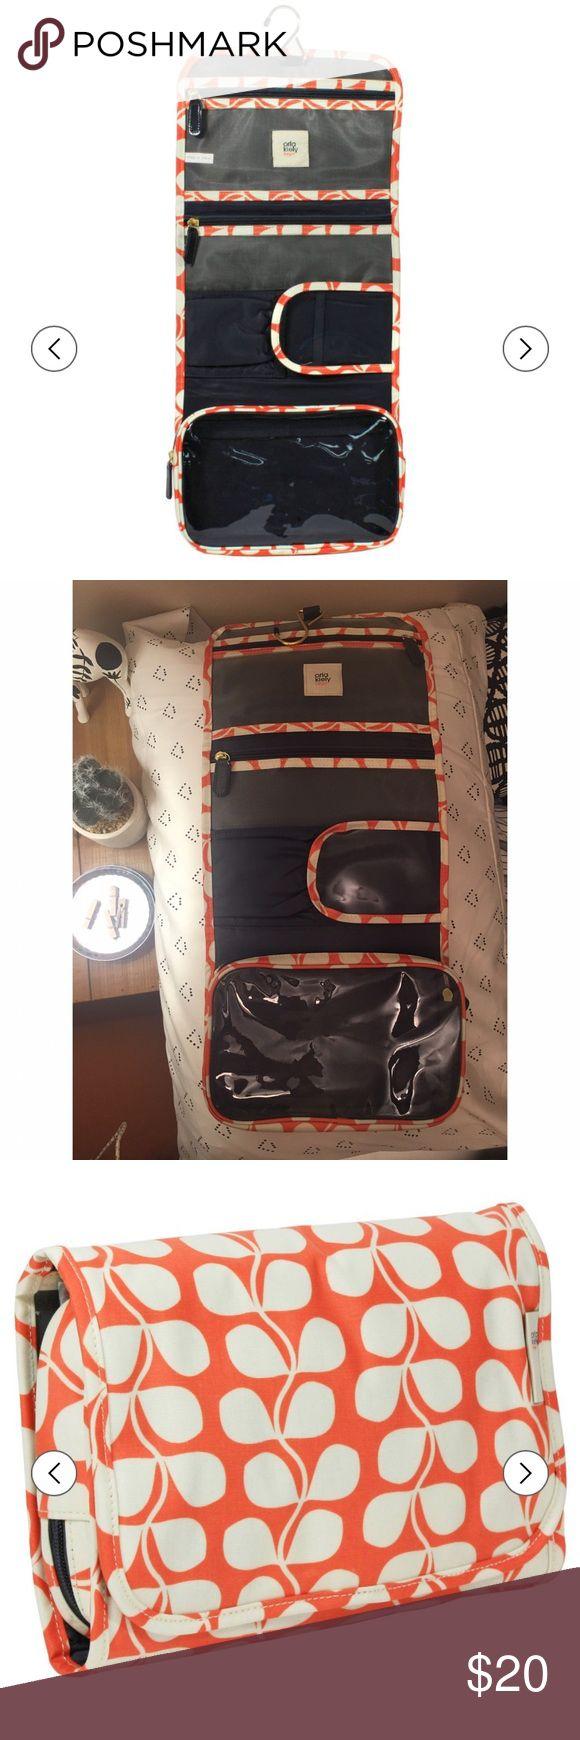 Orla Kiely Flower hanging cosmetic bag New without tags Orla Kiely Bags Cosmetic Bags & Cases